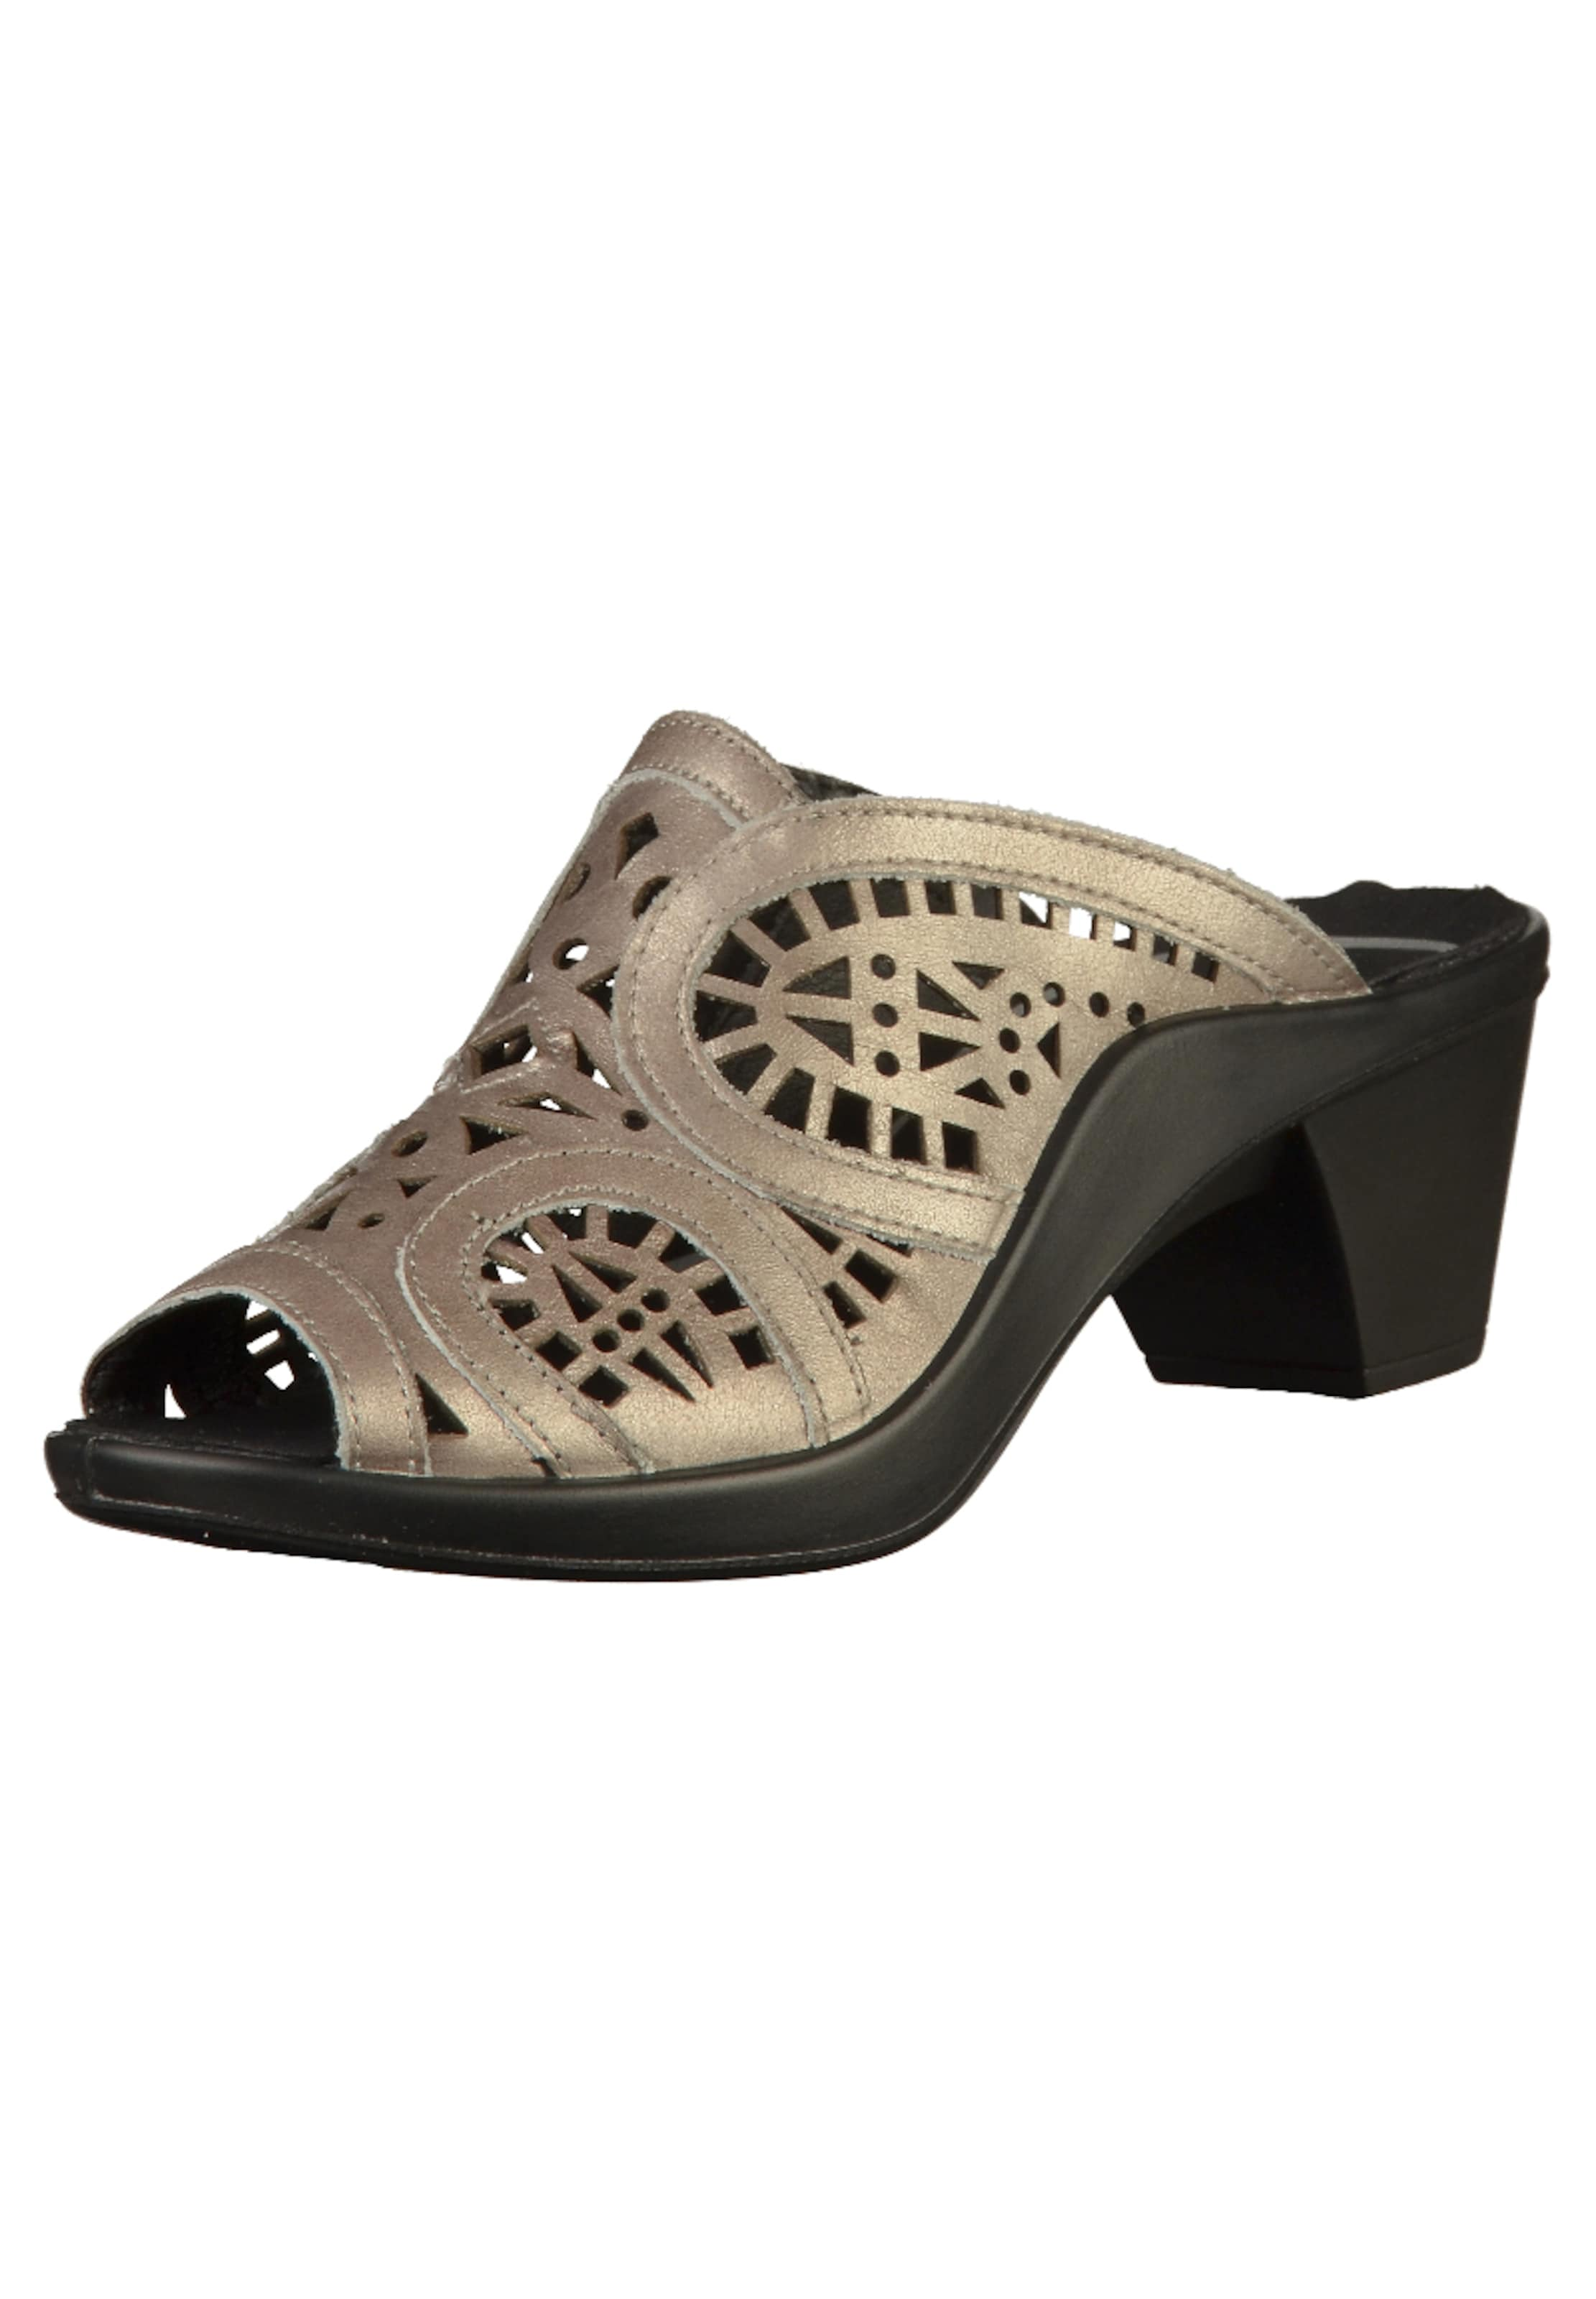 ROMIKA Pantoletten Verschleißfeste billige Schuhe Hohe Qualität